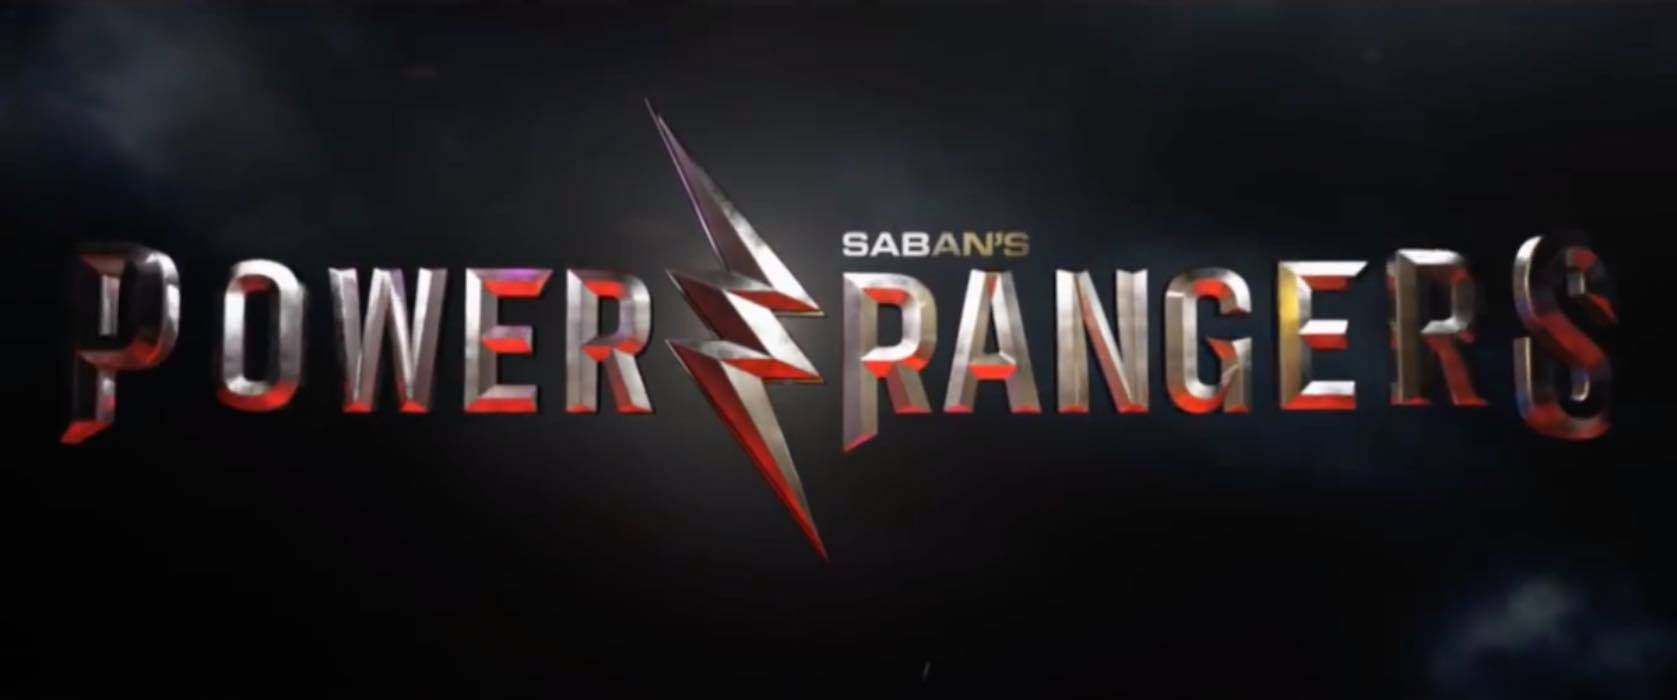 Rai 2, 'Power Rangers': trama, cast e tutte le curiosità sul film